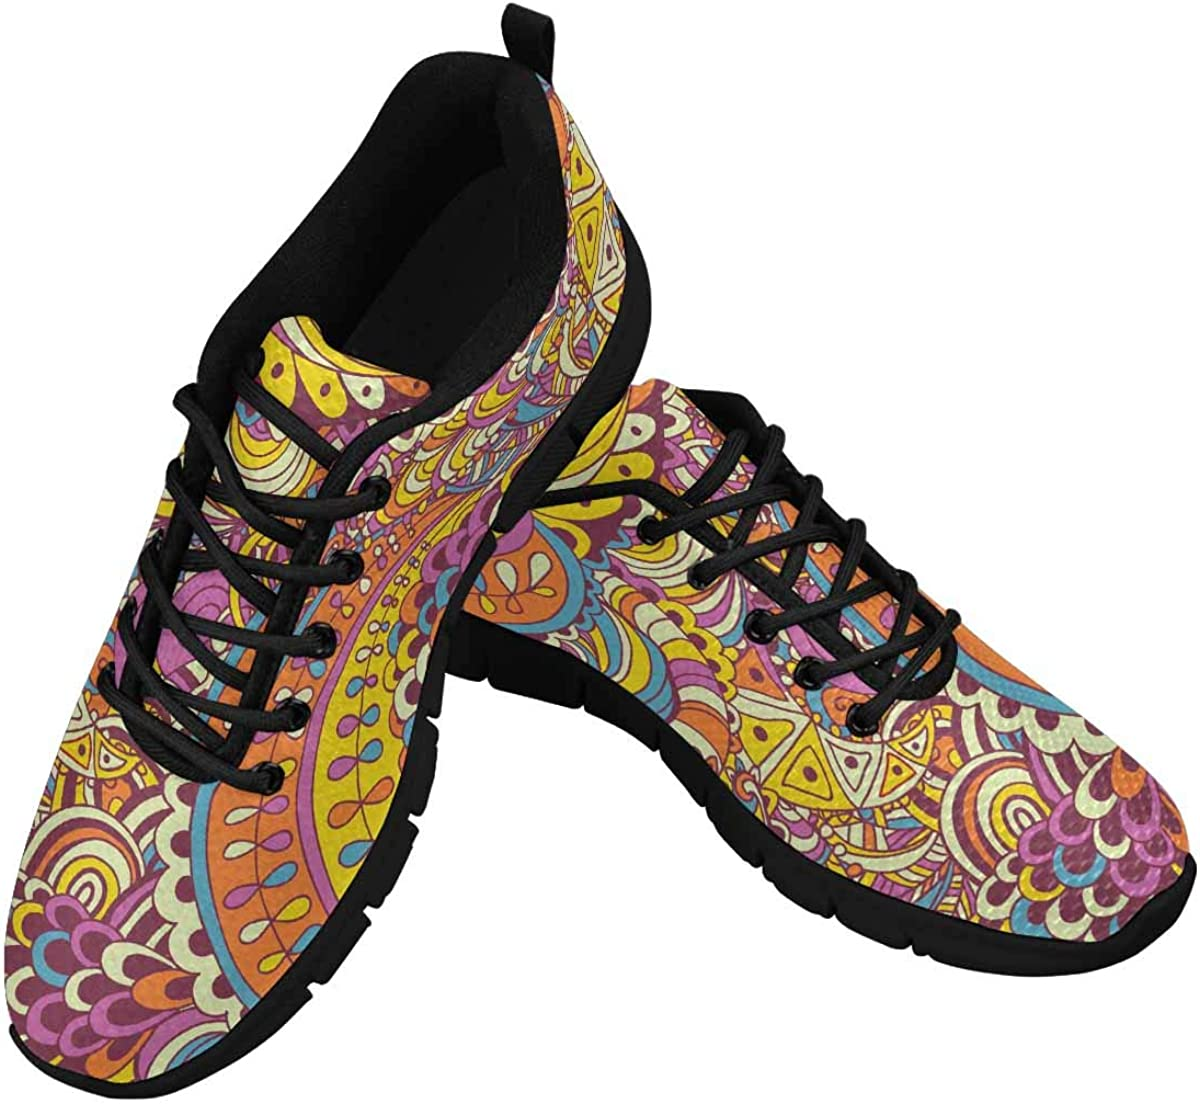 INTERESTPRINT Mandalas Paisley Pattern Women's Sneaker Lace Up Running Comfort Sports Shoes